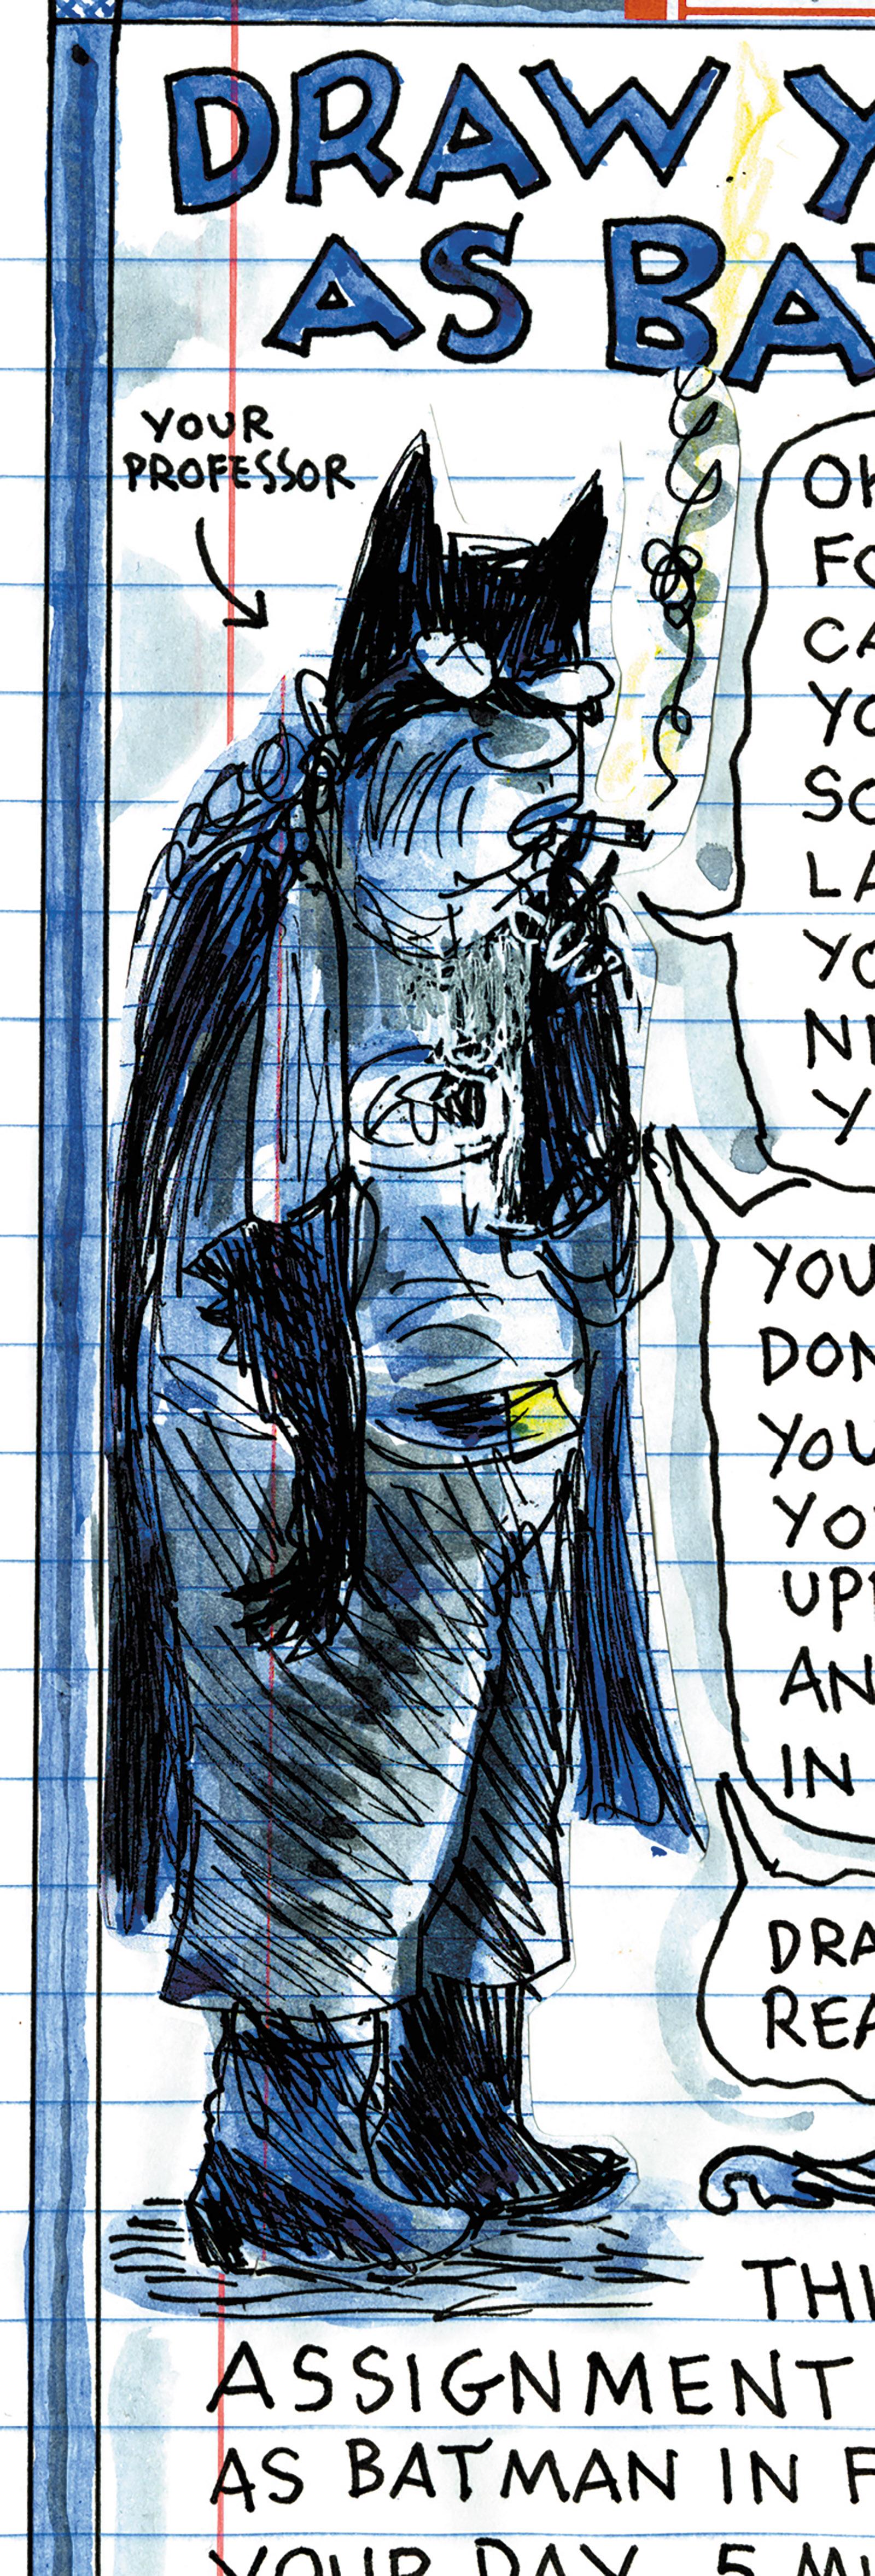 Lynda Barry's self-portrait as Batman, from Making Comics